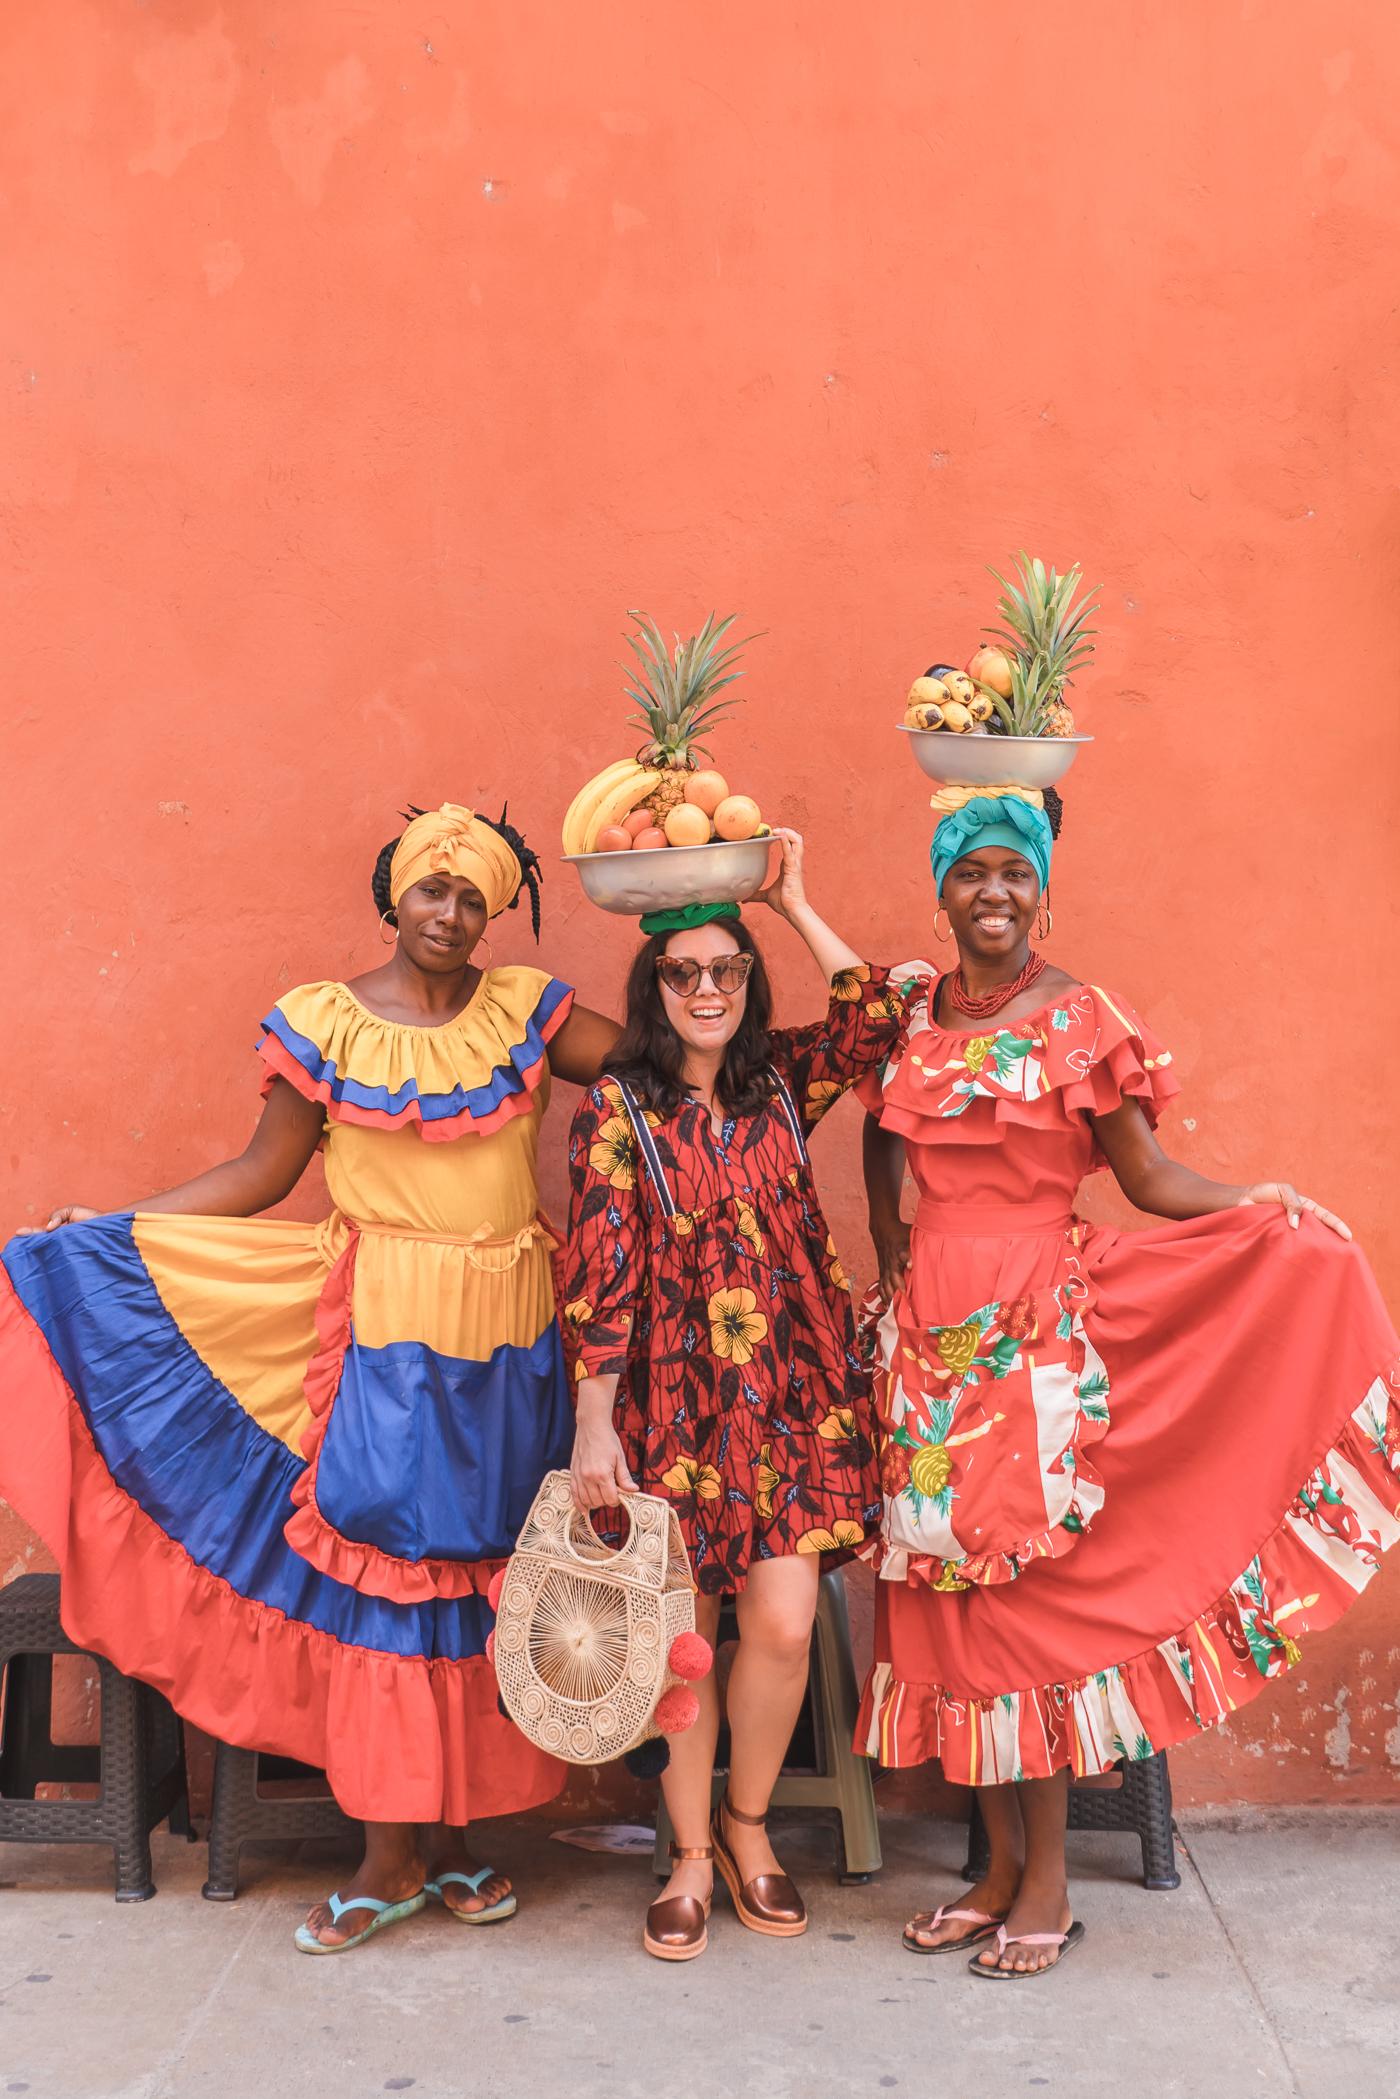 Updated Cartagena Guide